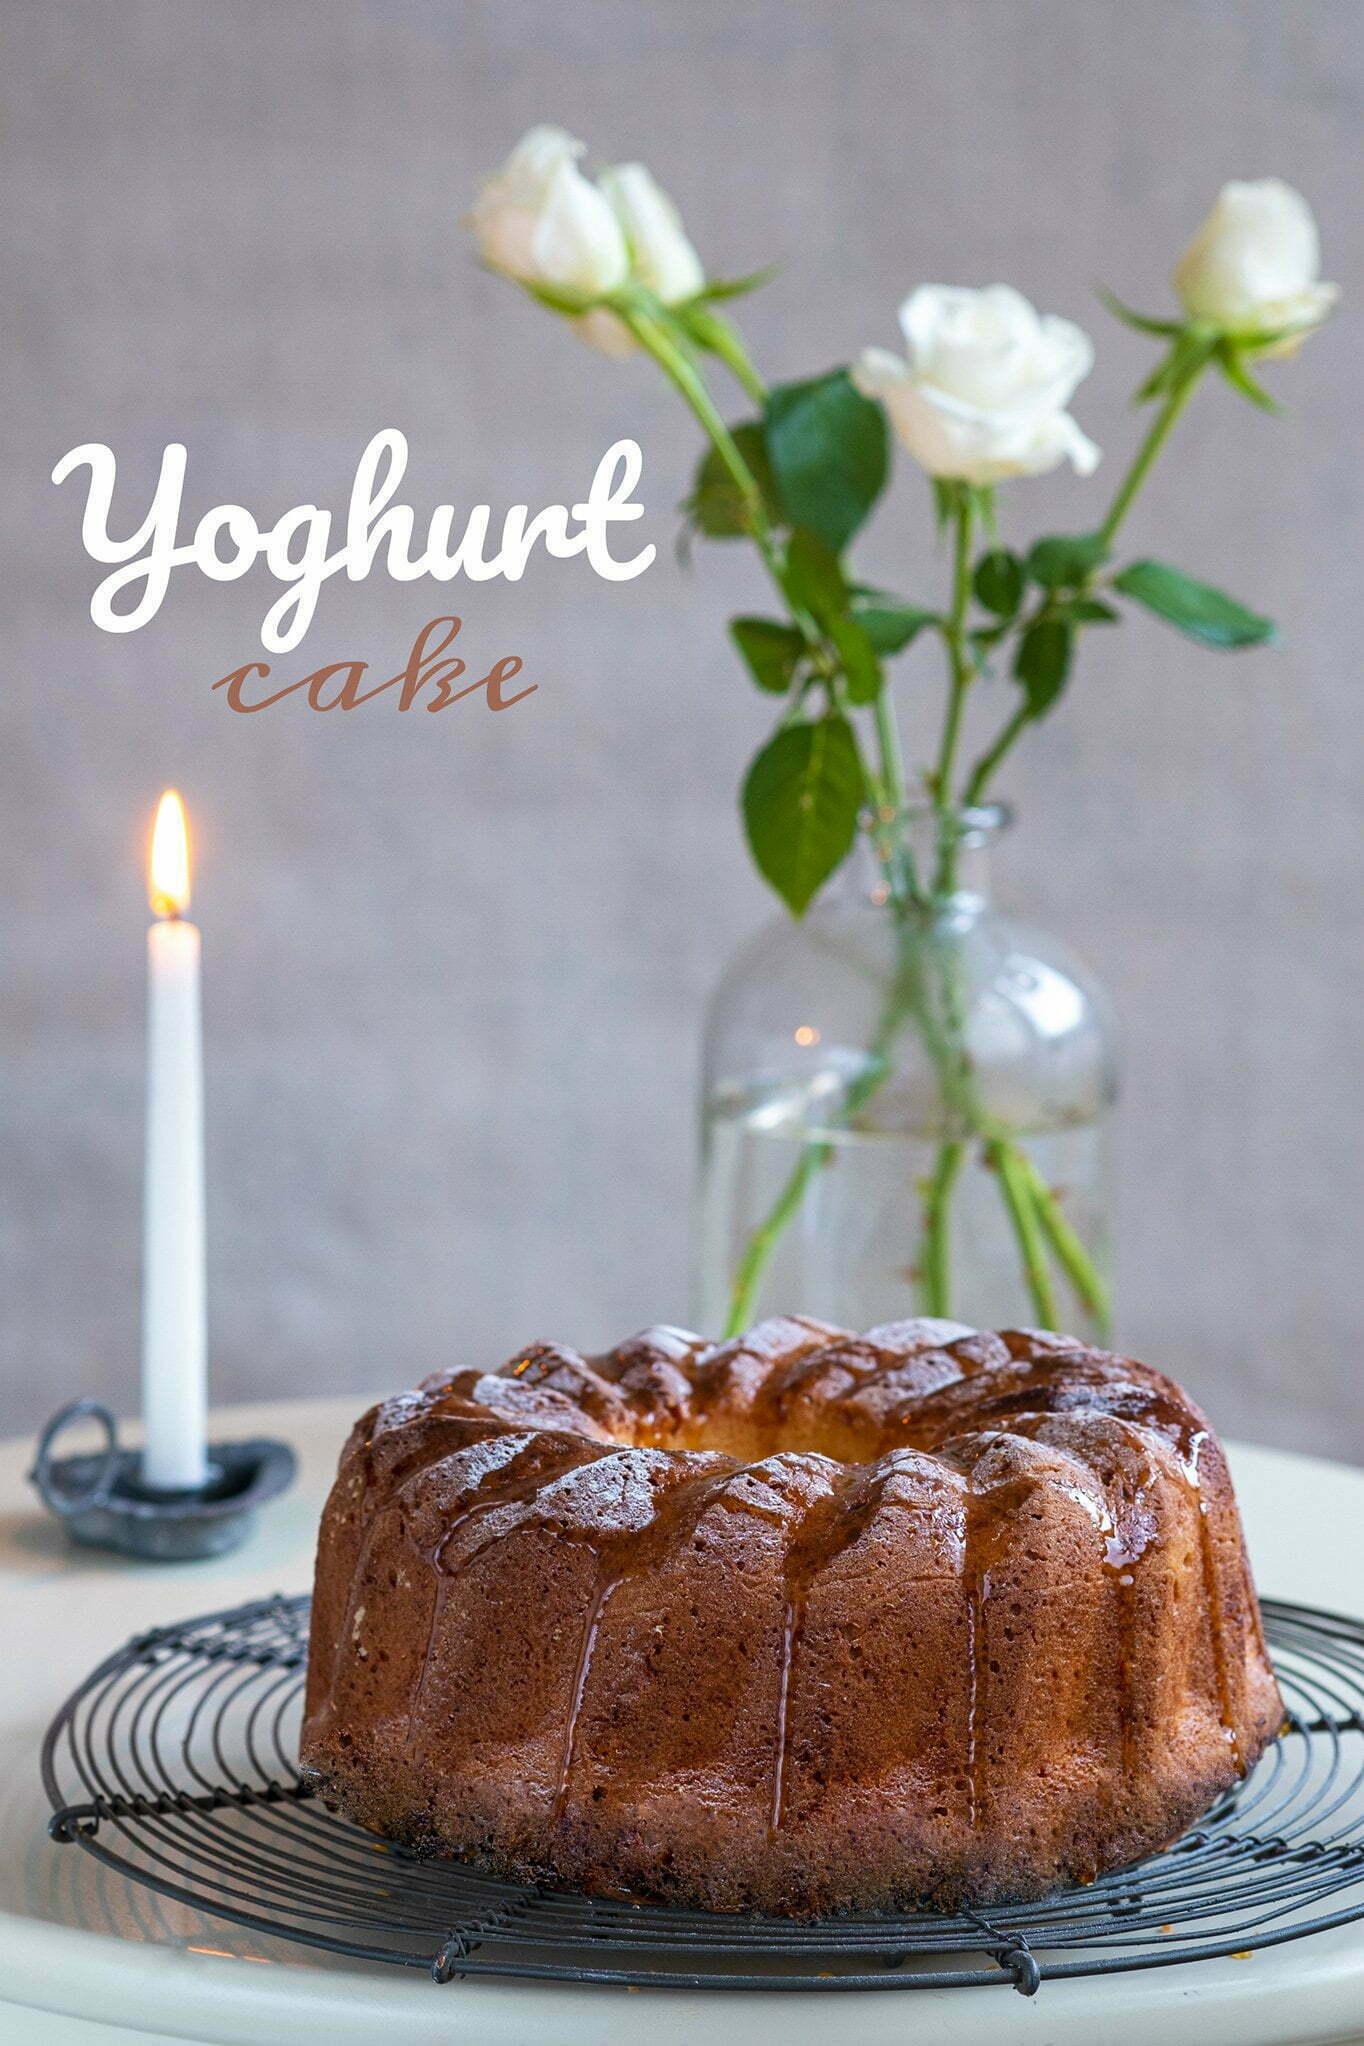 Yoghurt cake – Recept uit Portugal